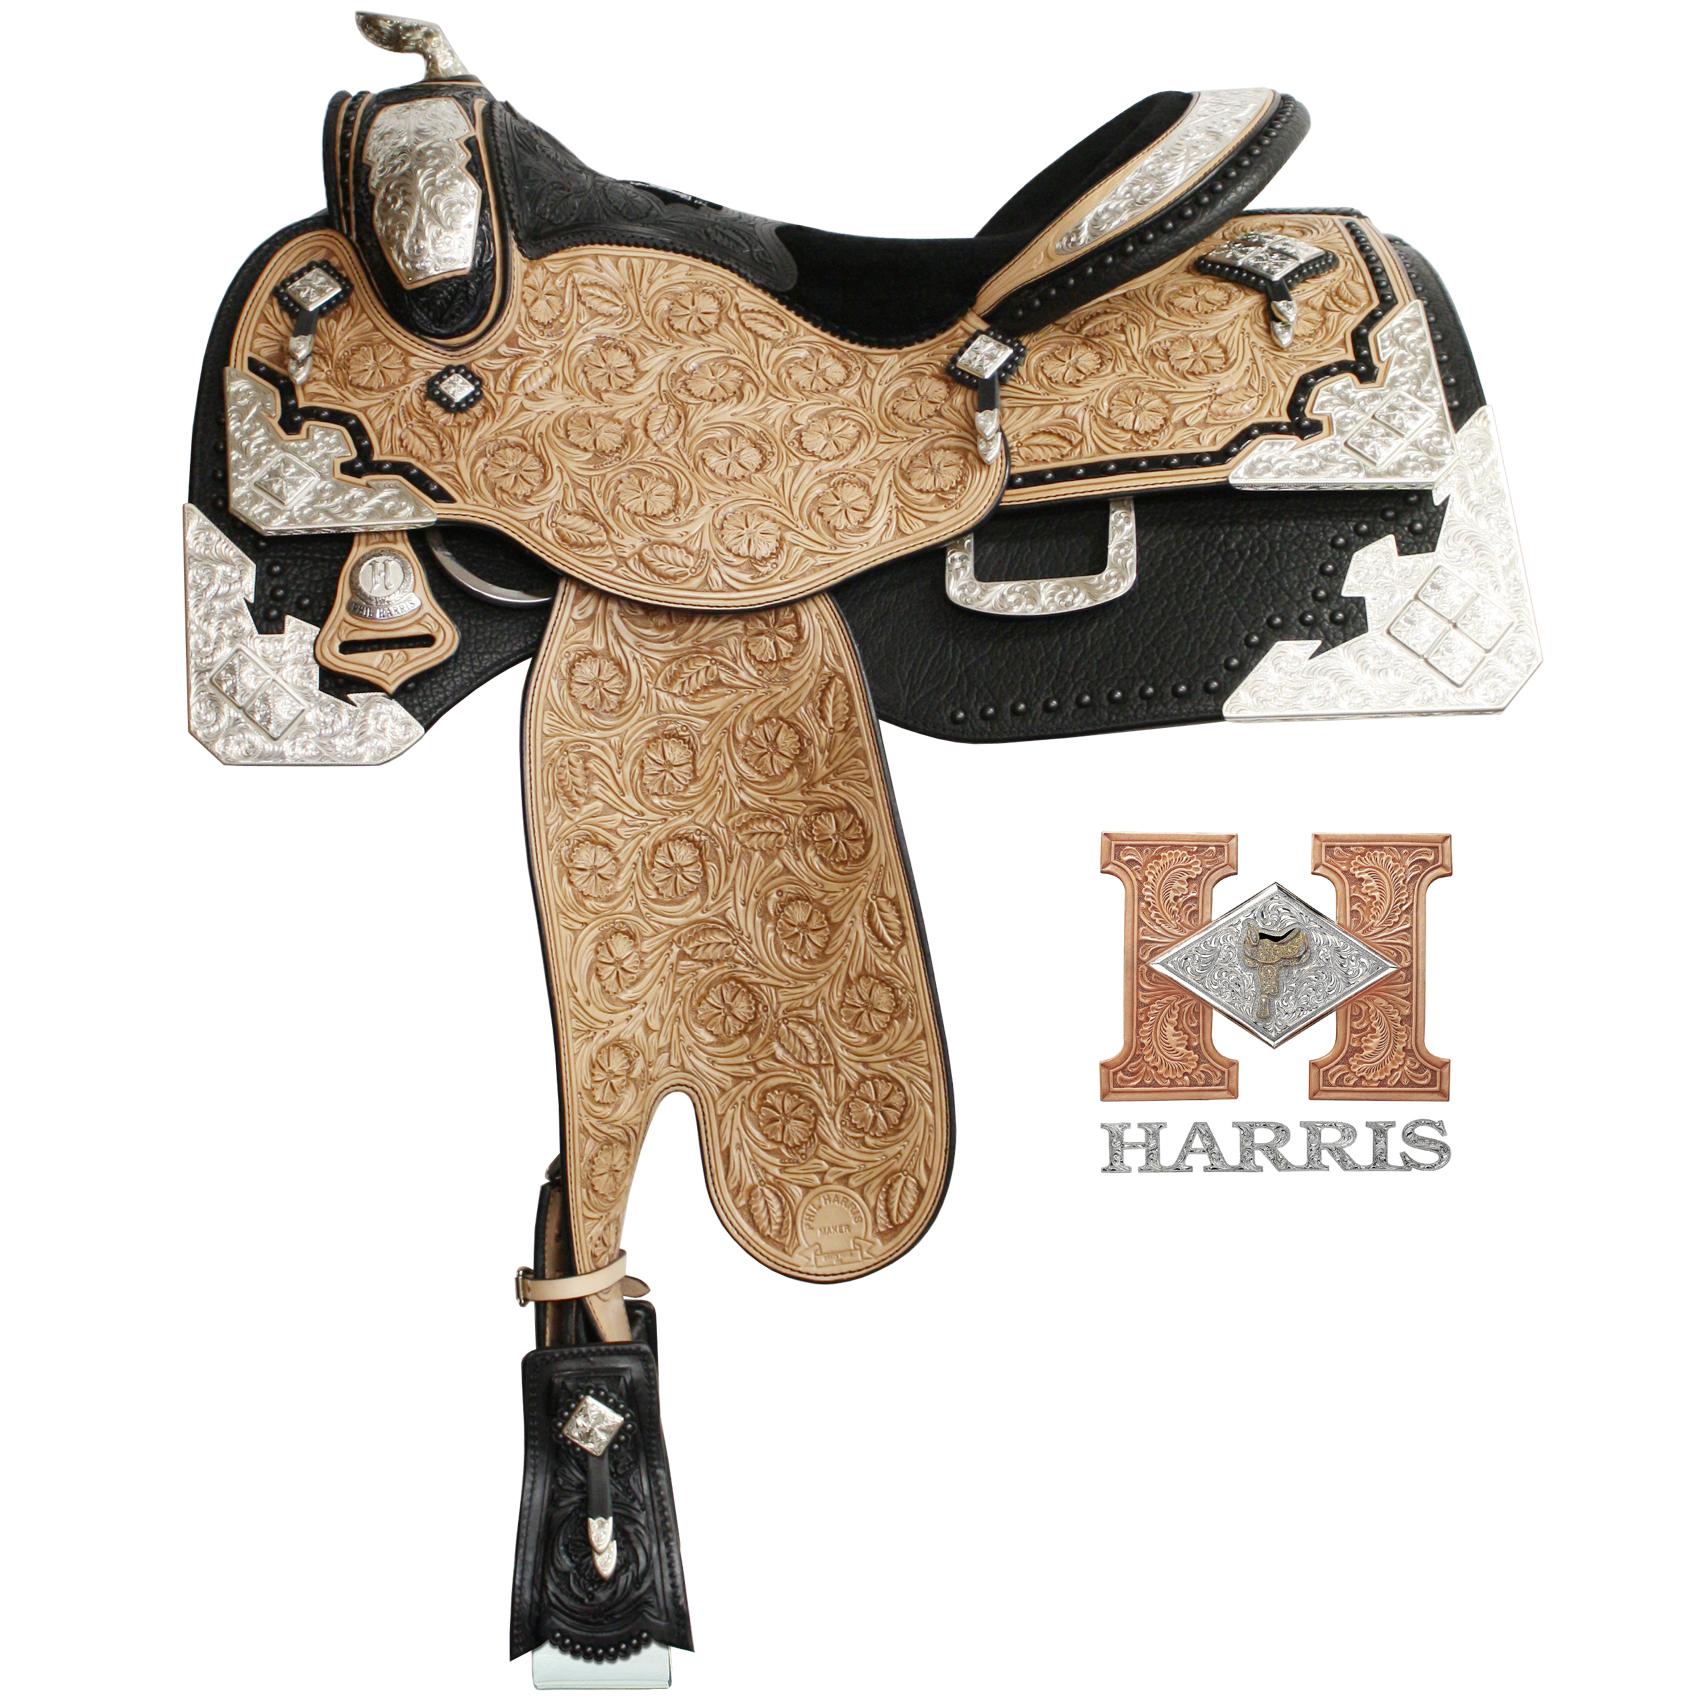 Harris Leather Amp Silverworks Legendary Handmade Saddles